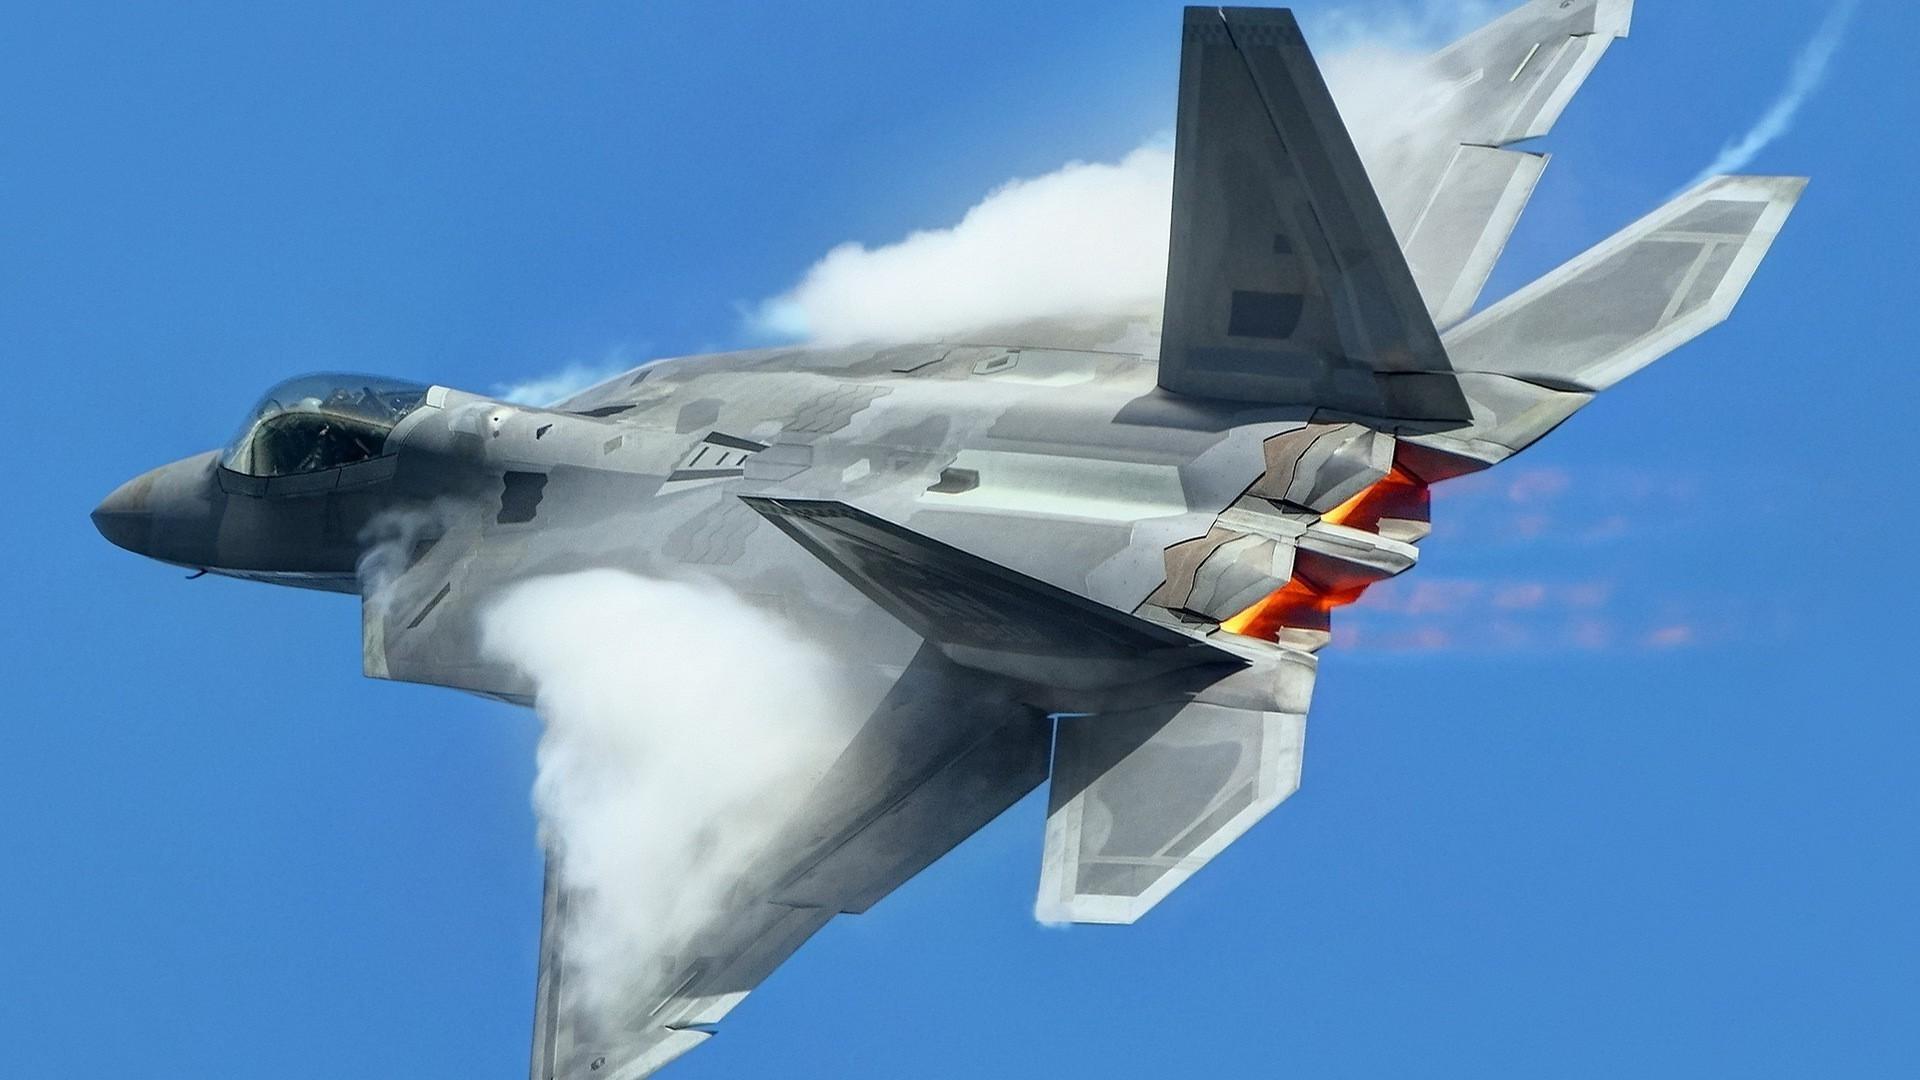 22 Raptor aircraft blue close up f 22 gray raptor 1920x1080